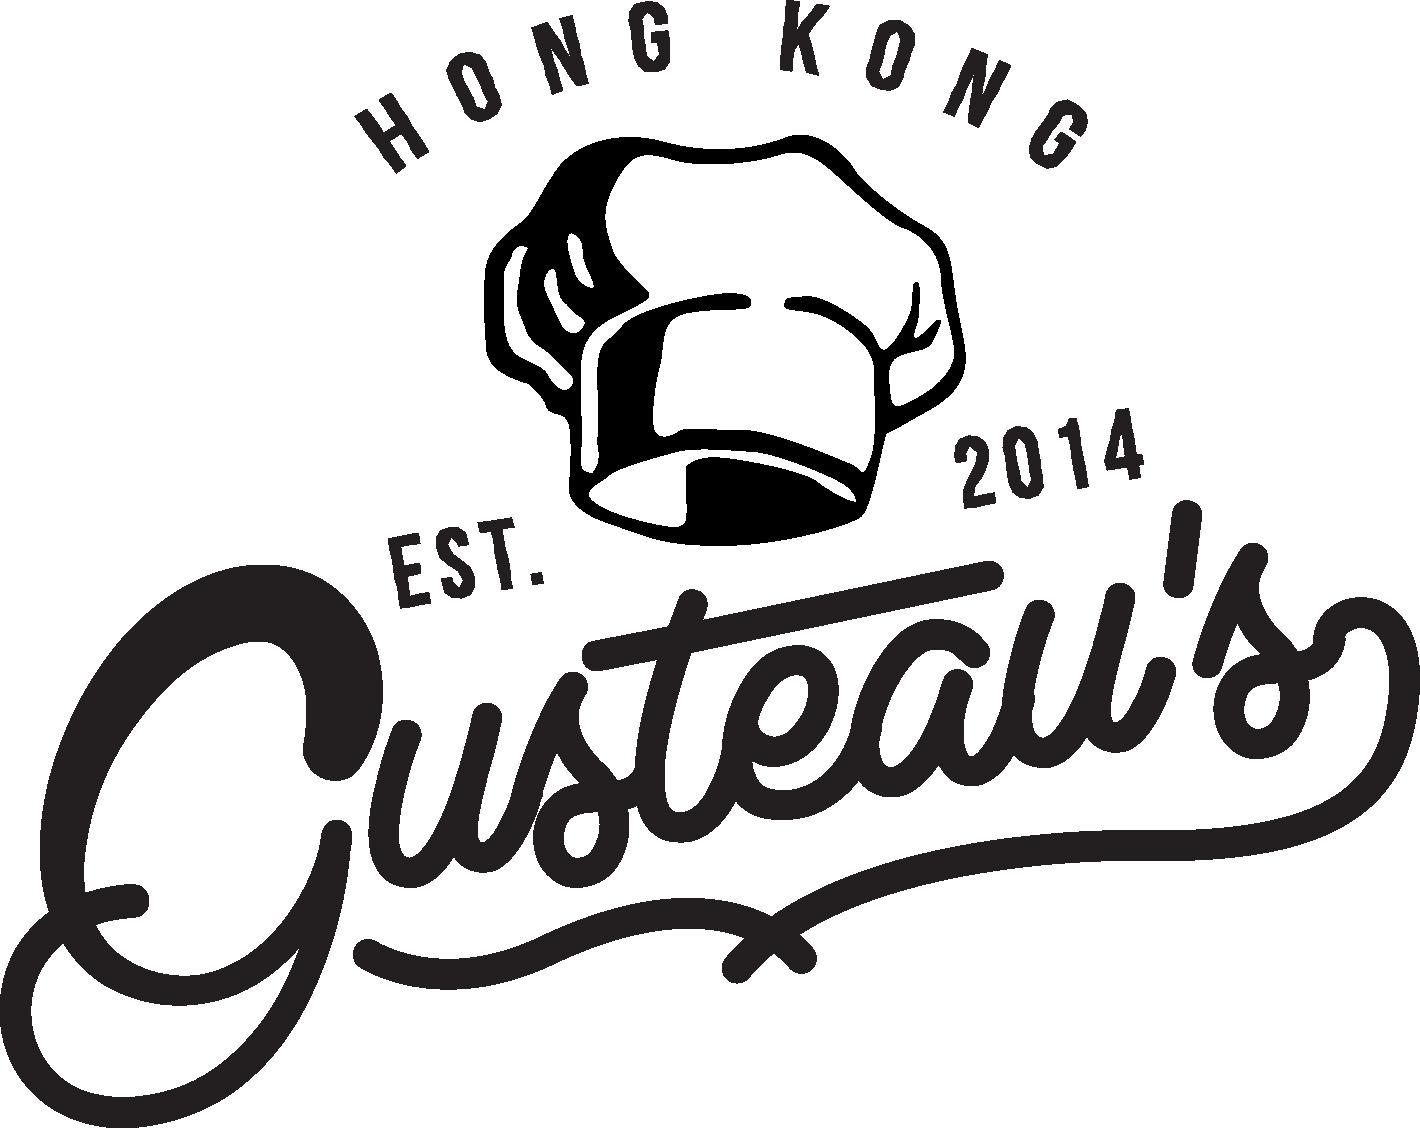 Gusteau's Hong Kong